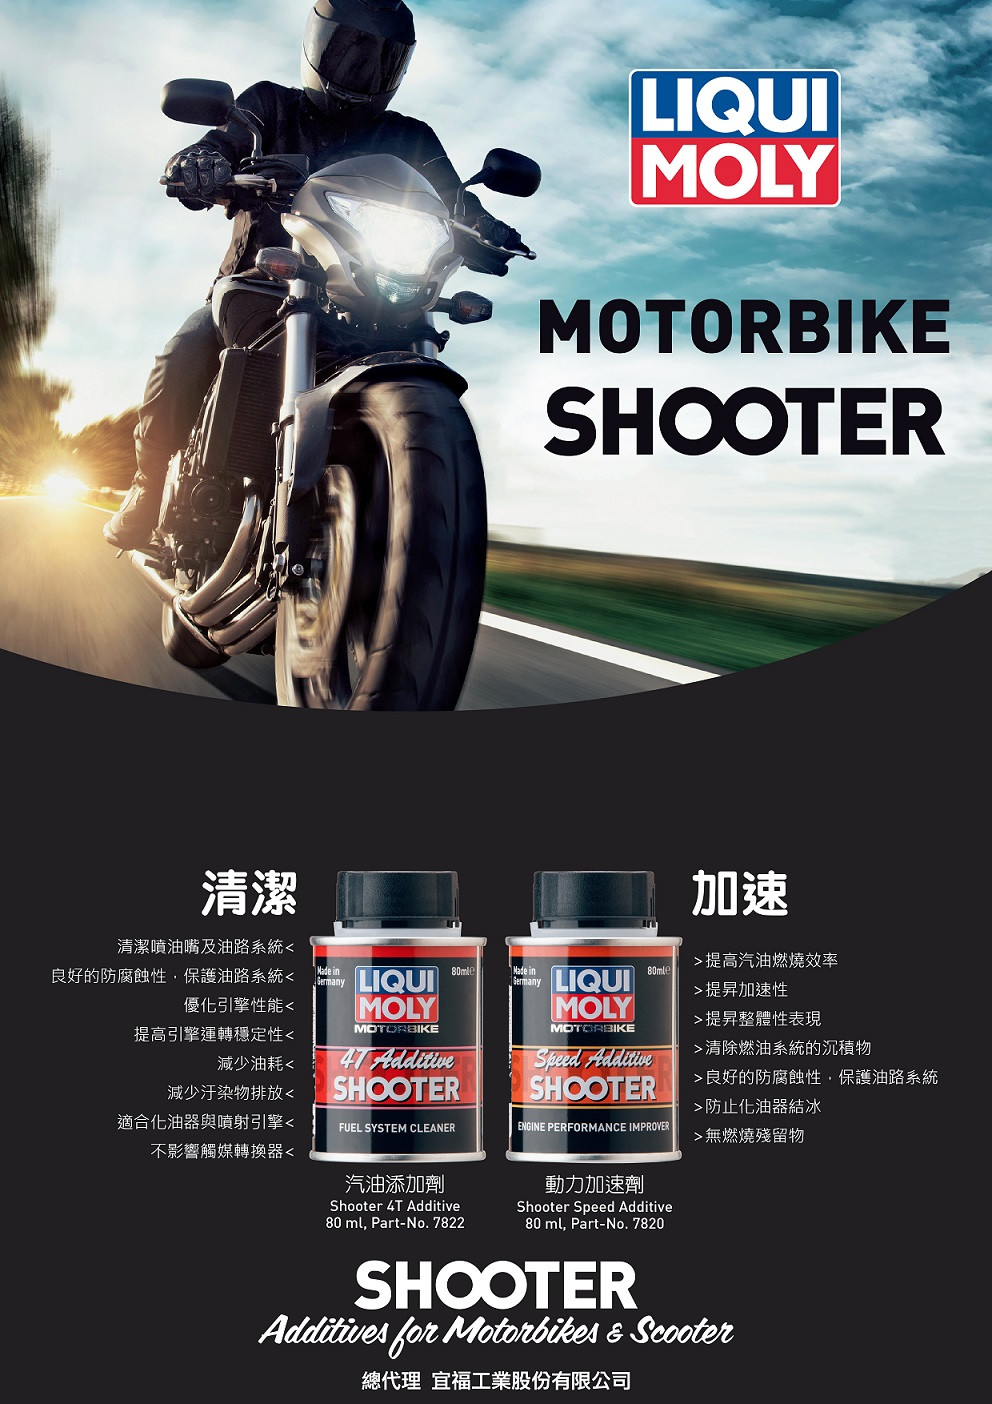 motorbike shooter